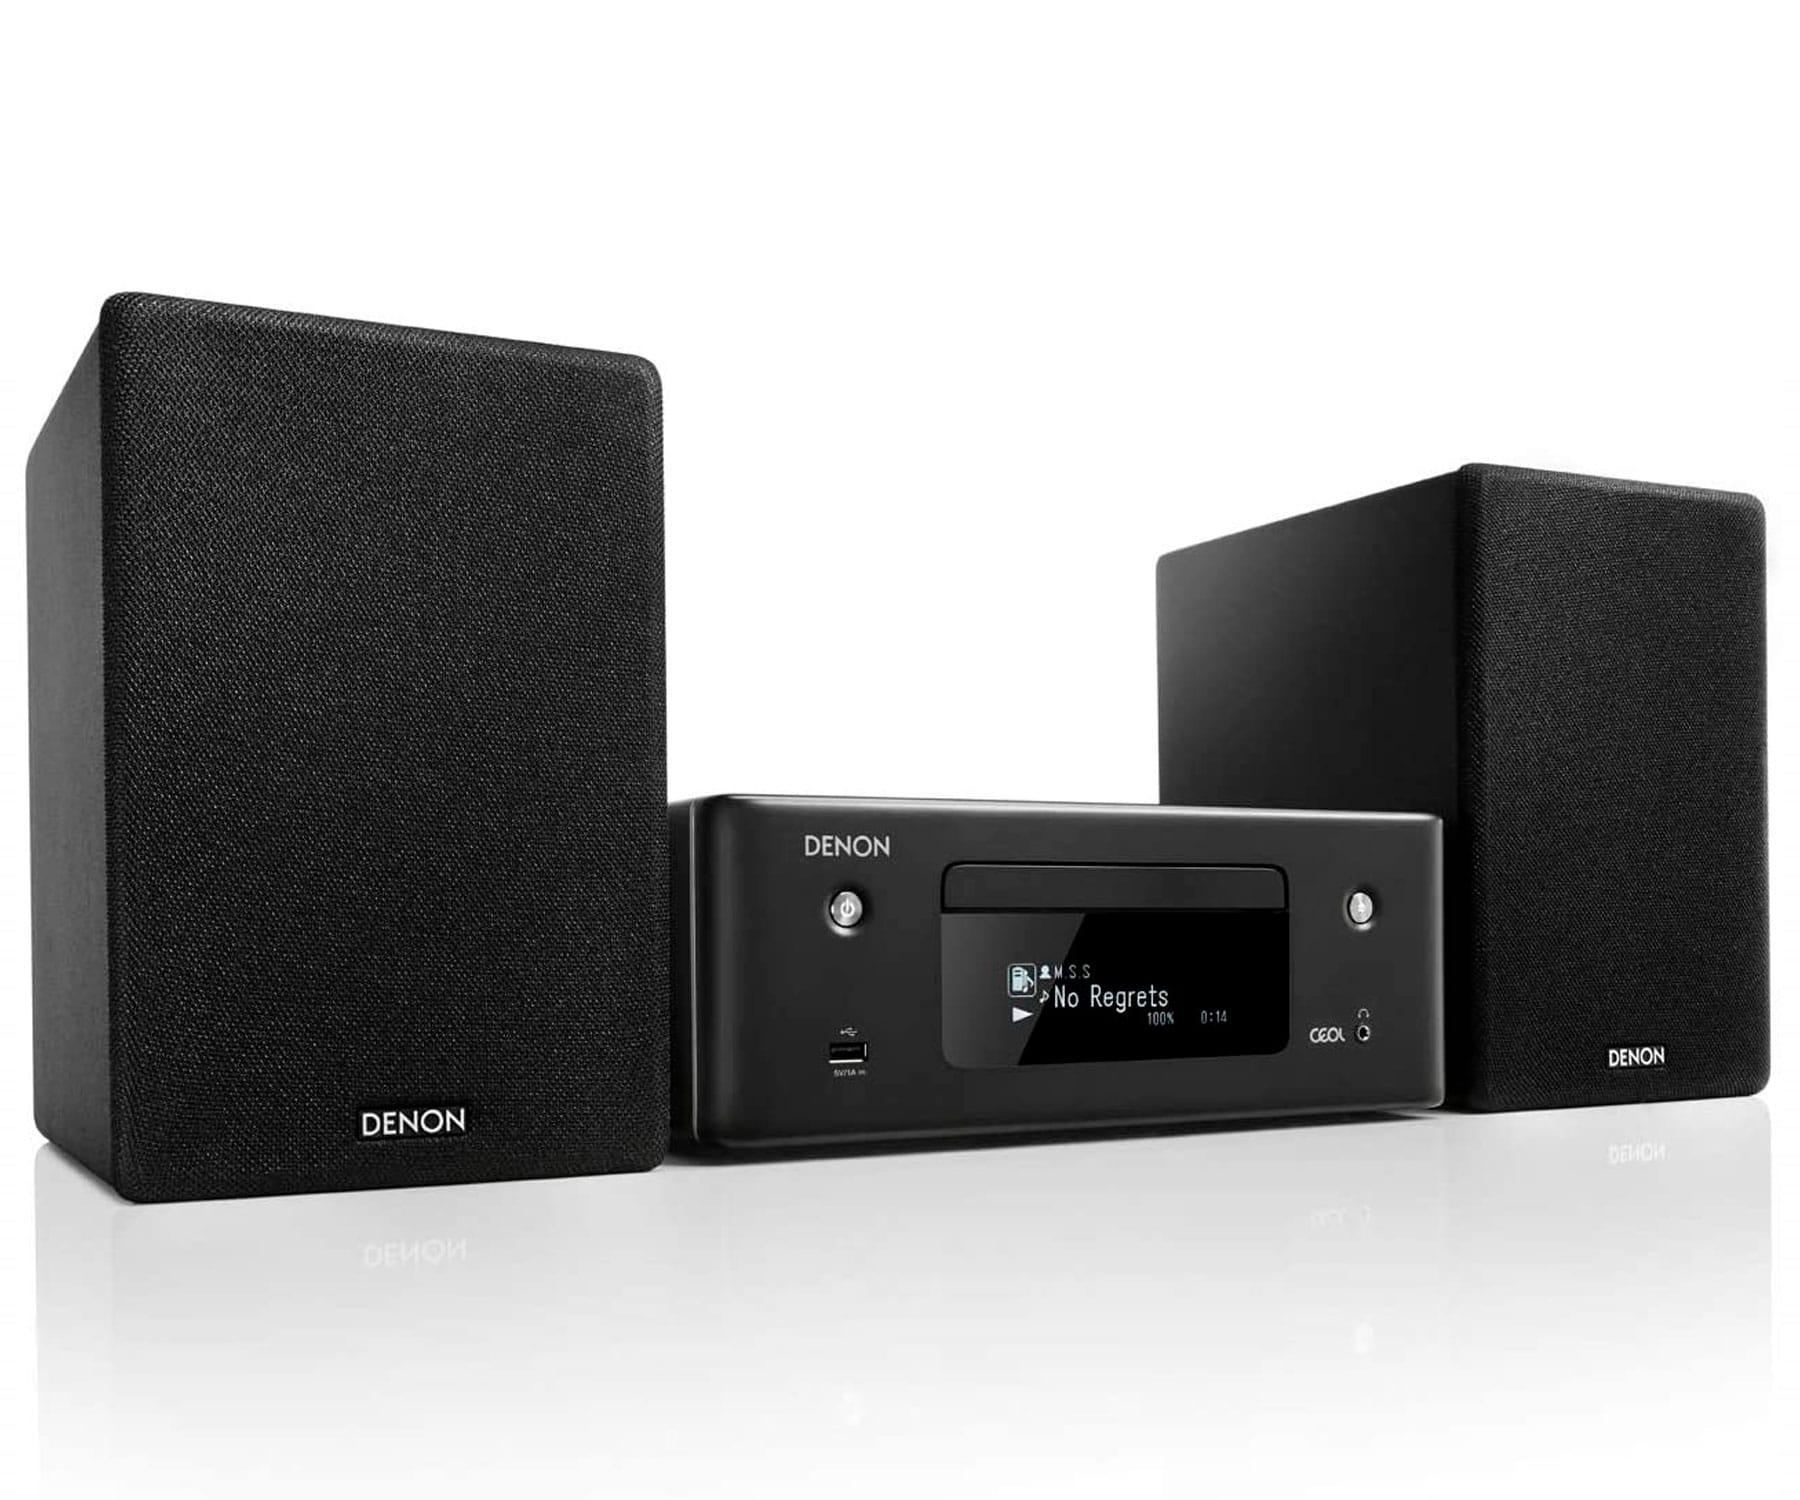 Denon CEOL N10 Negro Microcadena/Bluetooth/130W RMS/Airplay 2/Tecnología HEOS